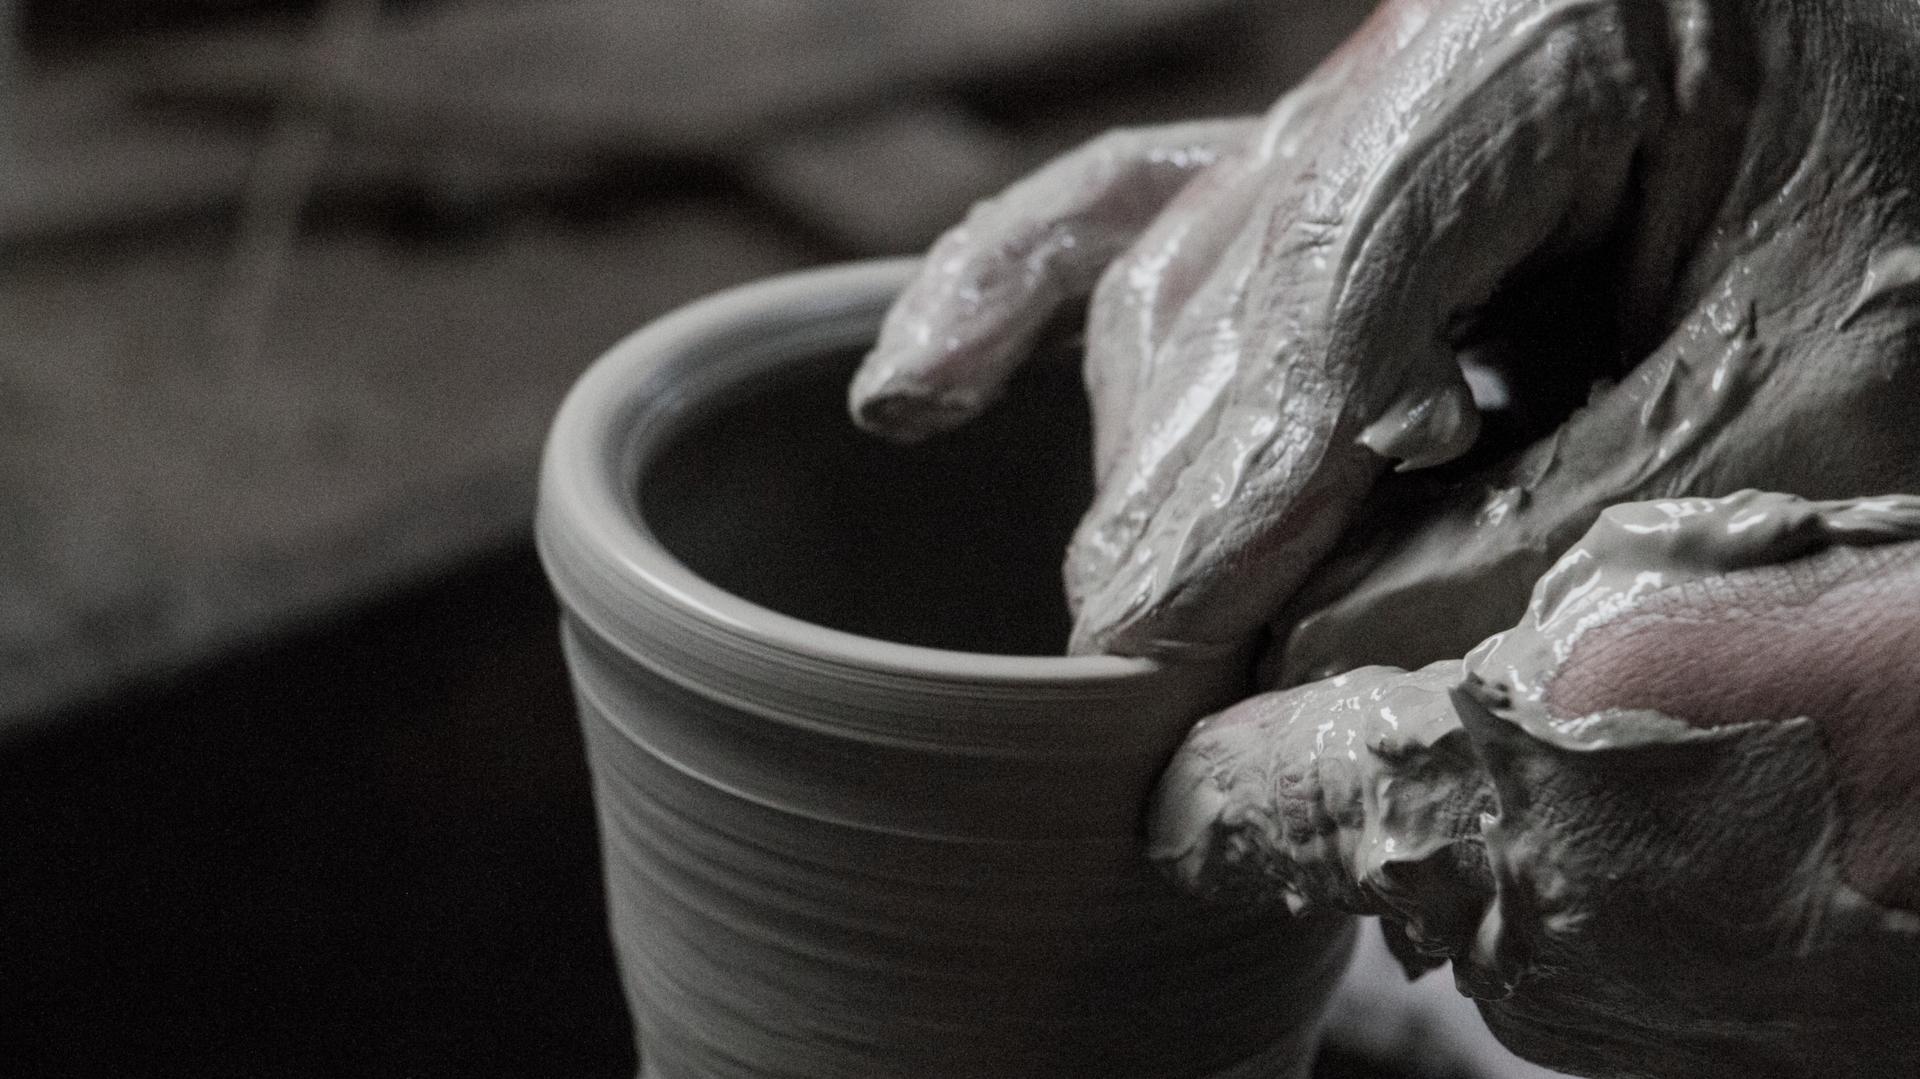 陶磁器の卸問屋|有限会社 陶秀 全国の高品質の和食器を厳選